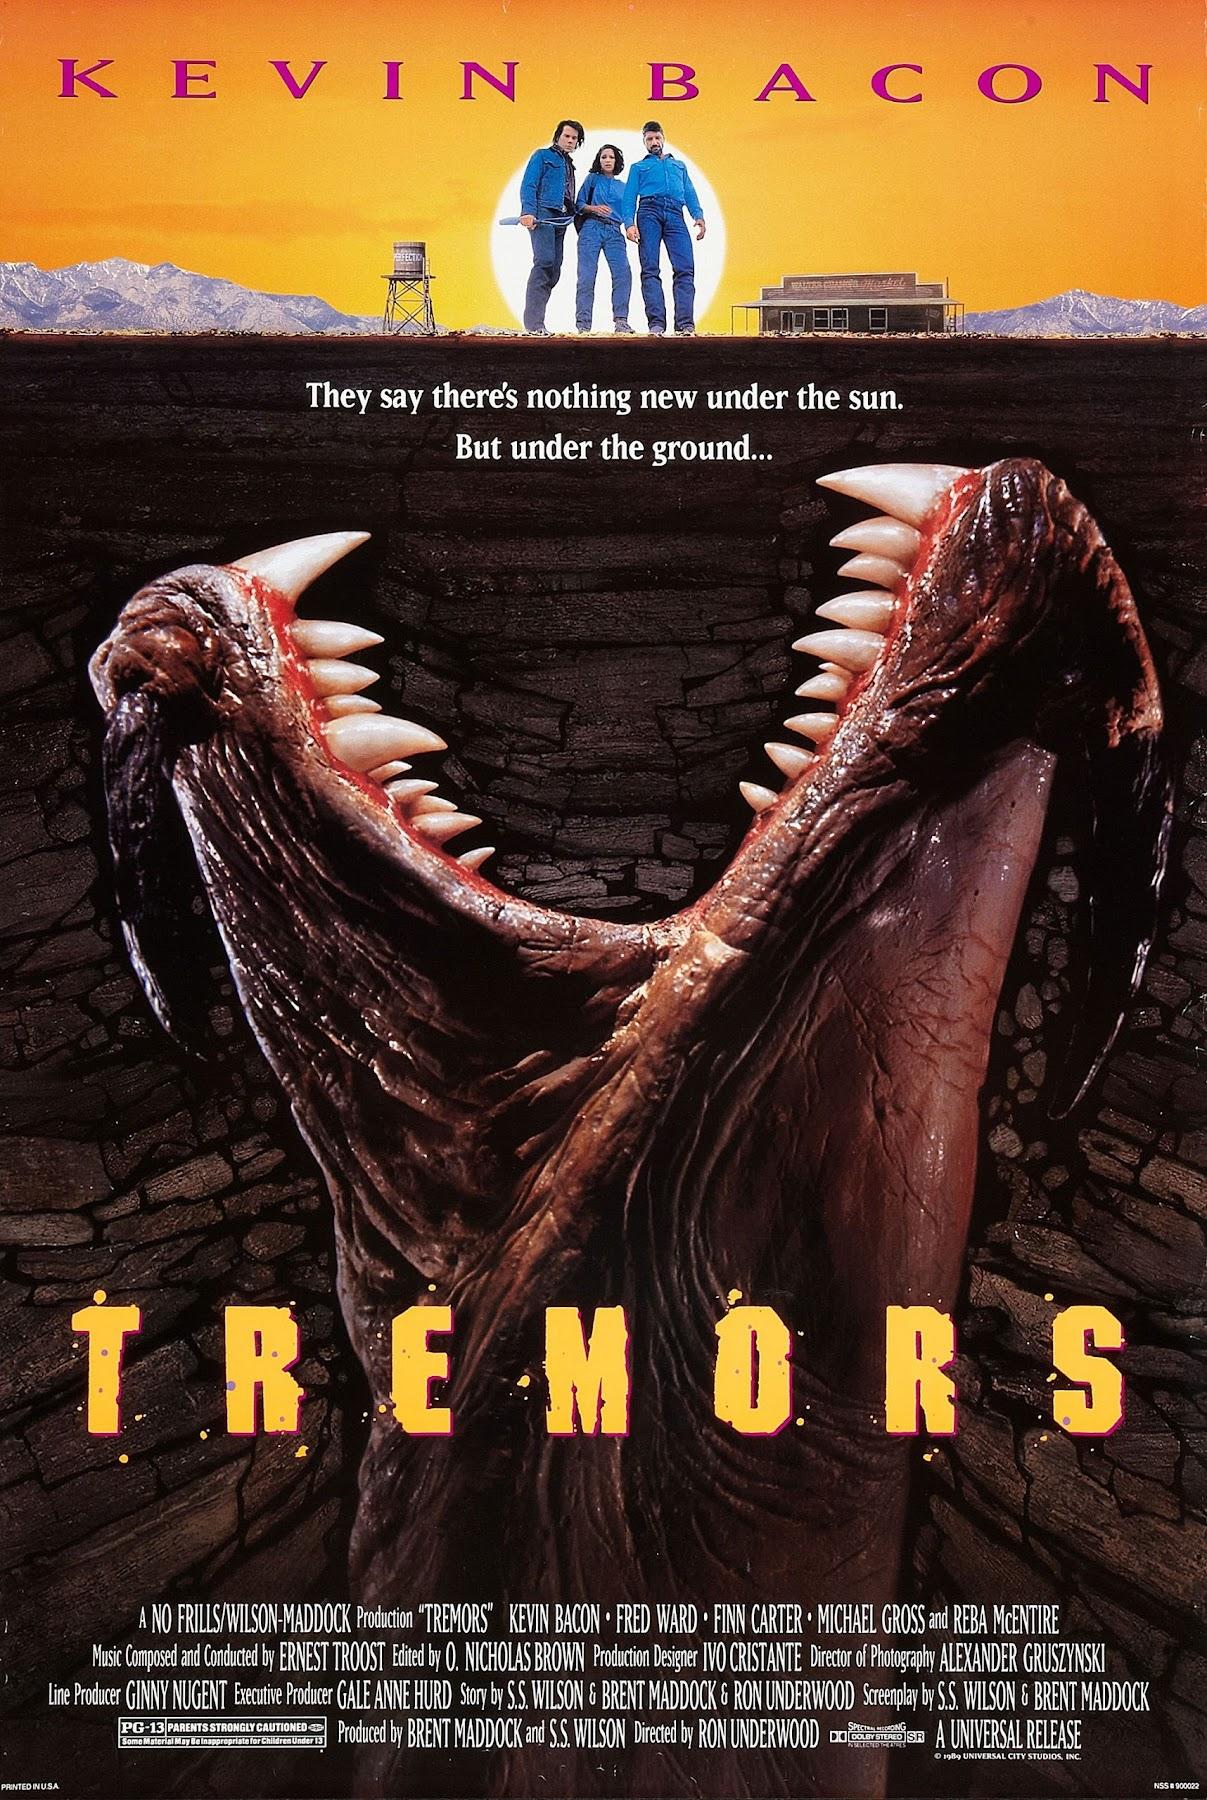 http://1.bp.blogspot.com/-BksfGUlncMg/UAErMLL6JrI/AAAAAAAAiXQ/2YvBiODV6YQ/s1800/Temblores+(Tremors)+(Ron+Underwood,+1989)---poster015.jpg